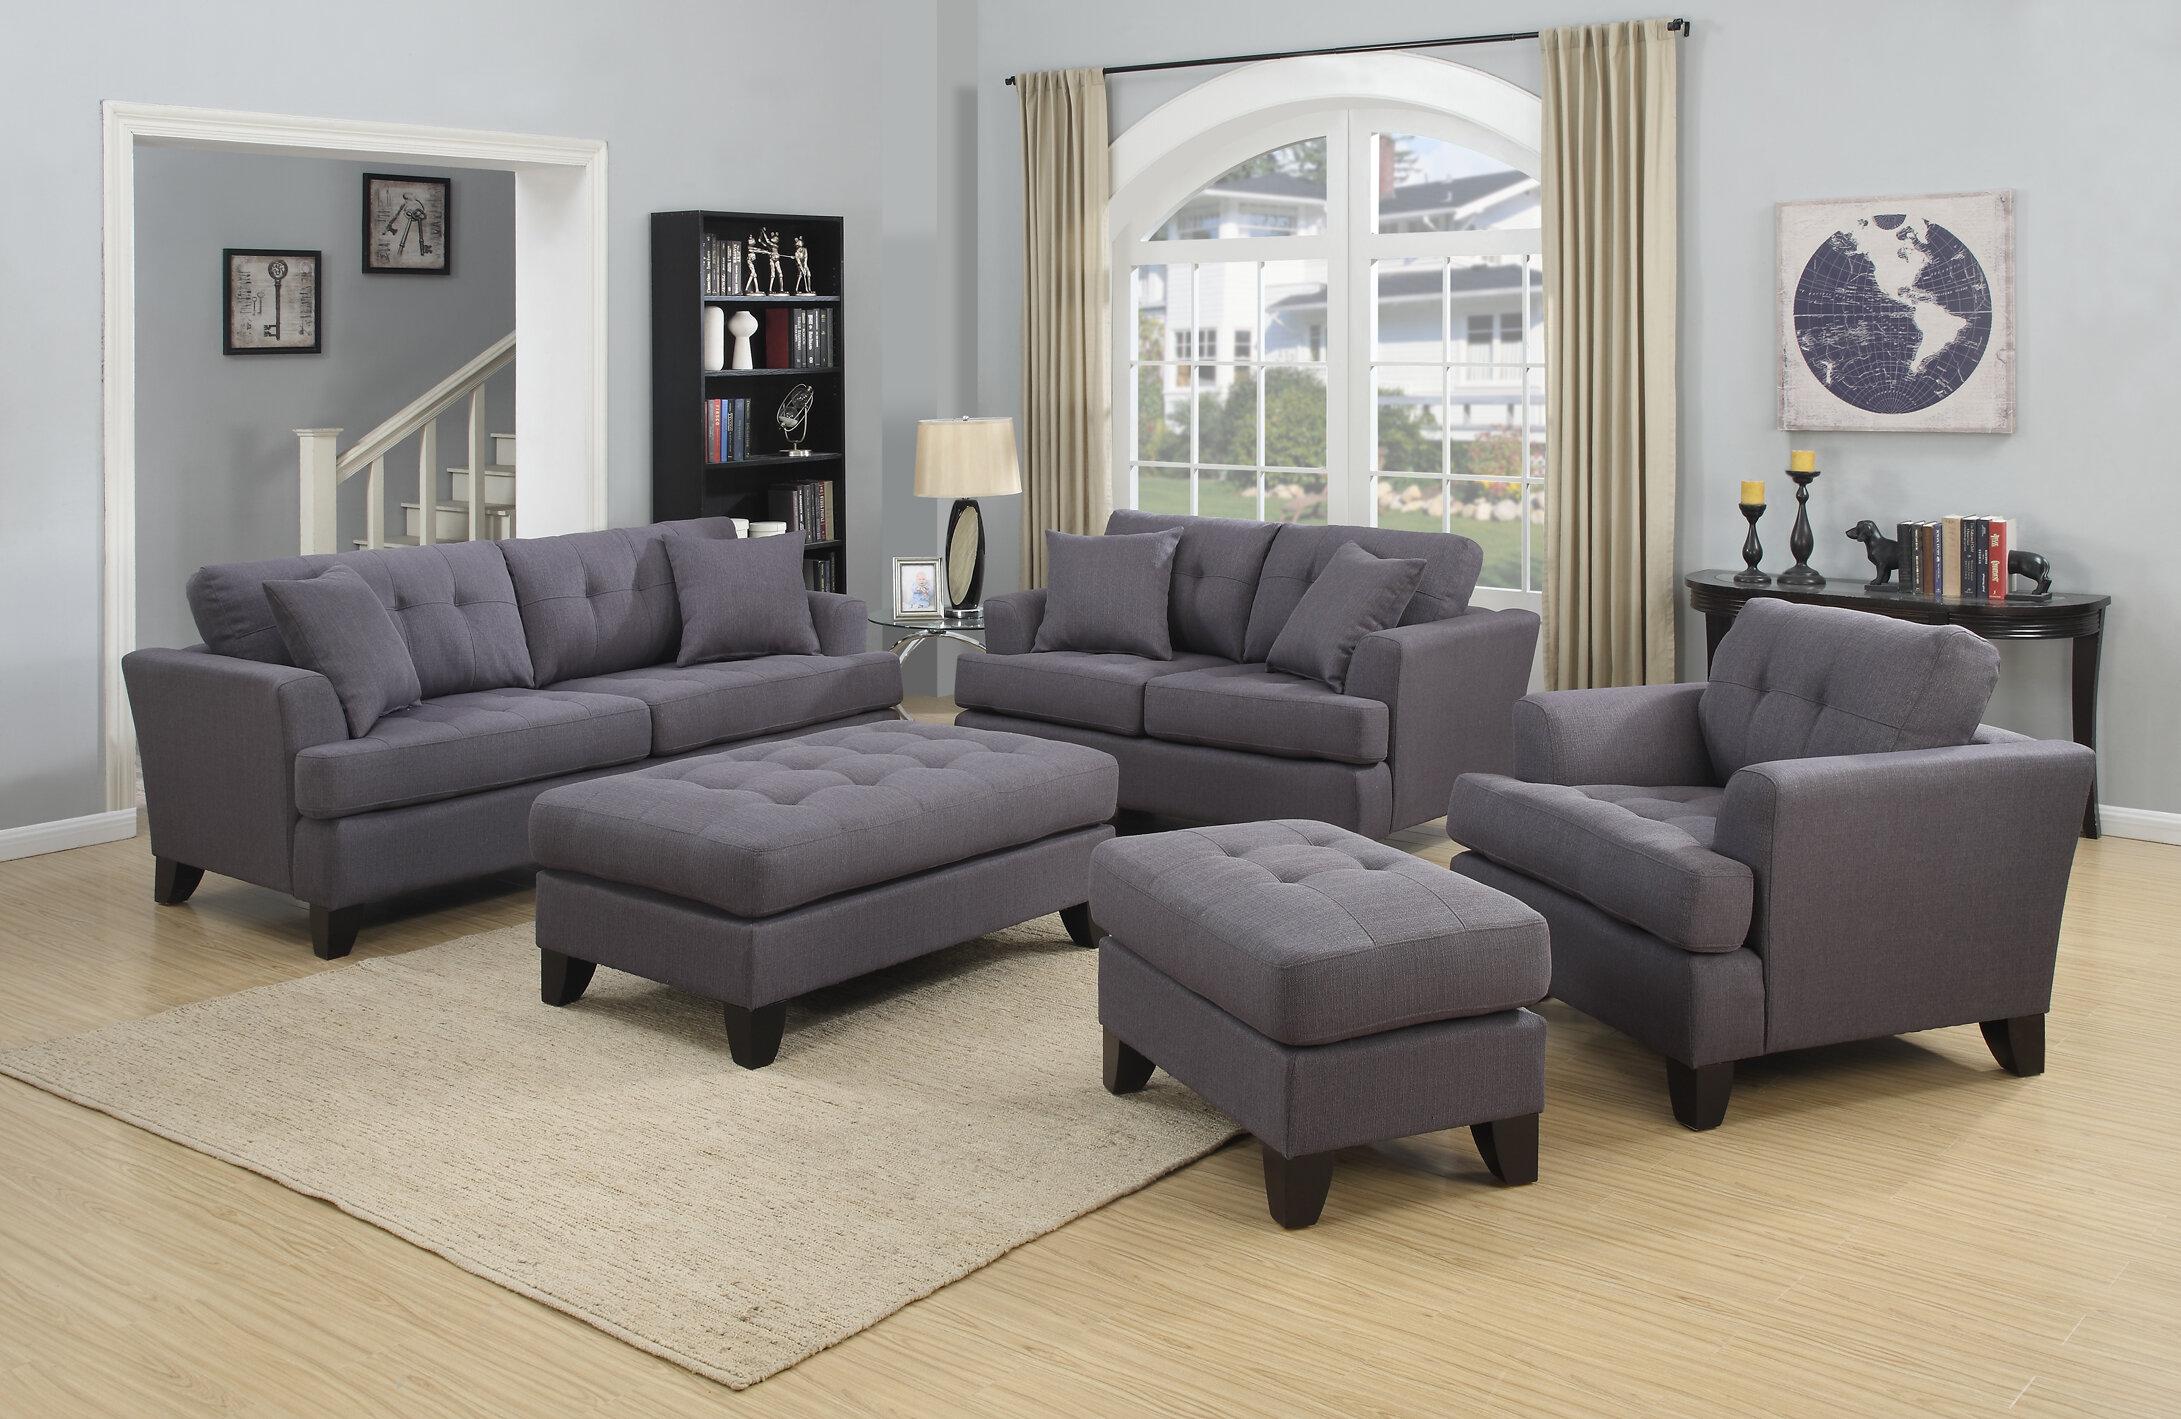 Alcott hill heger contemporary tufted living room set wayfair